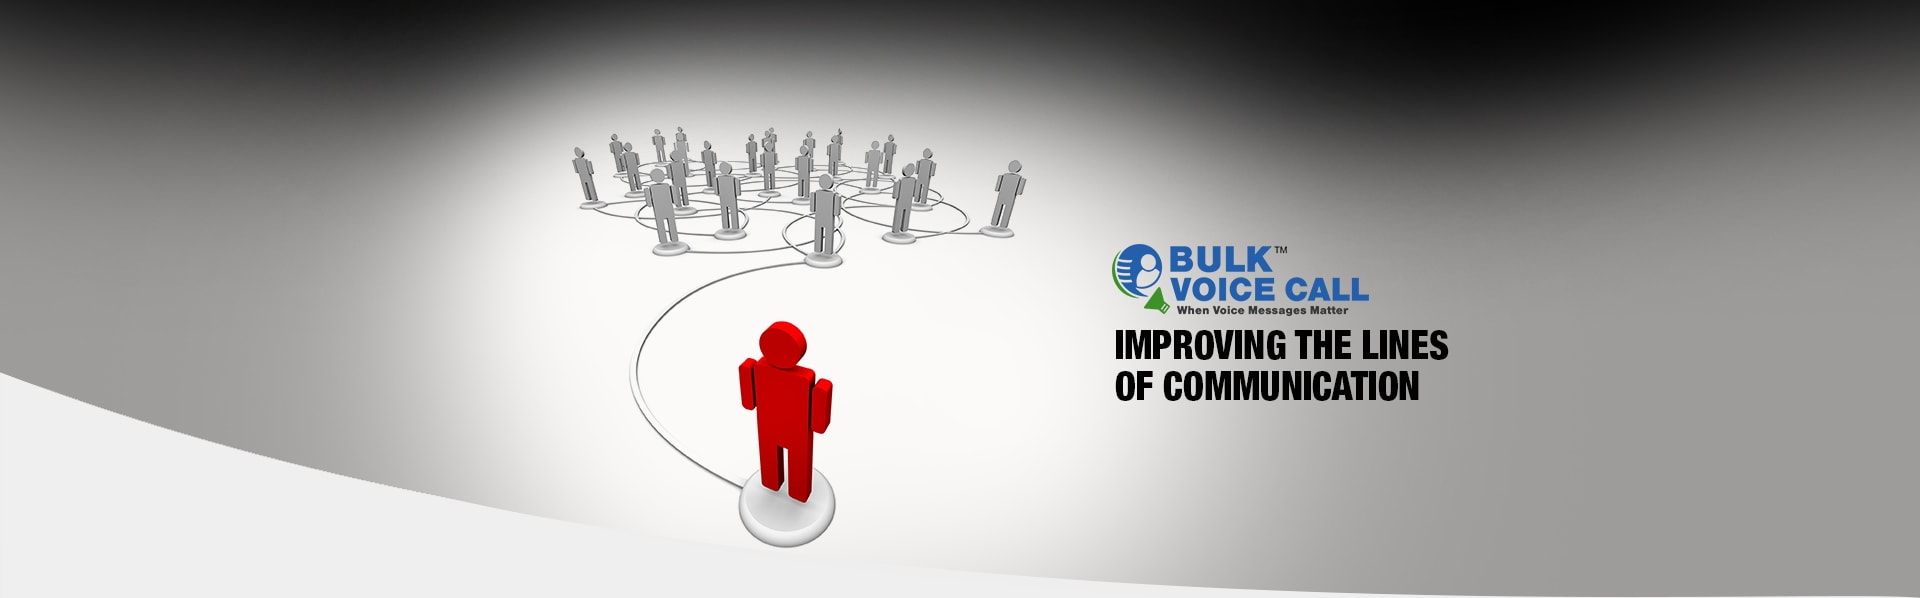 Bulk voice call banner